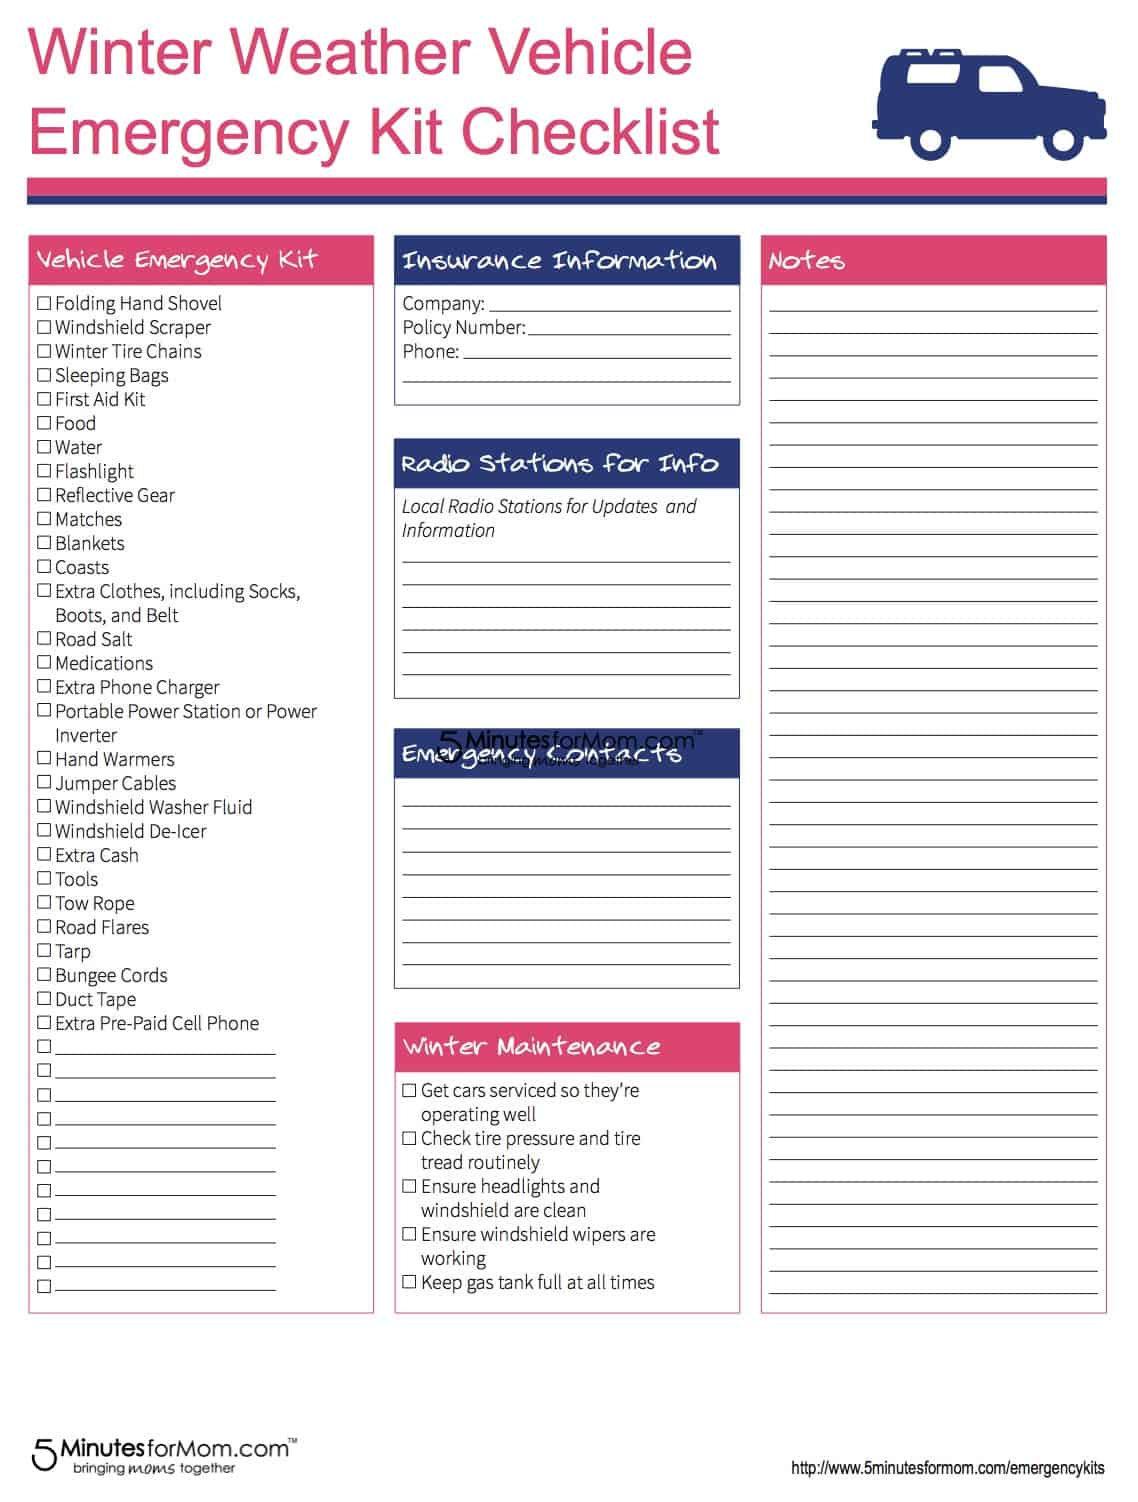 Vehicle Emergency Kit Checklist